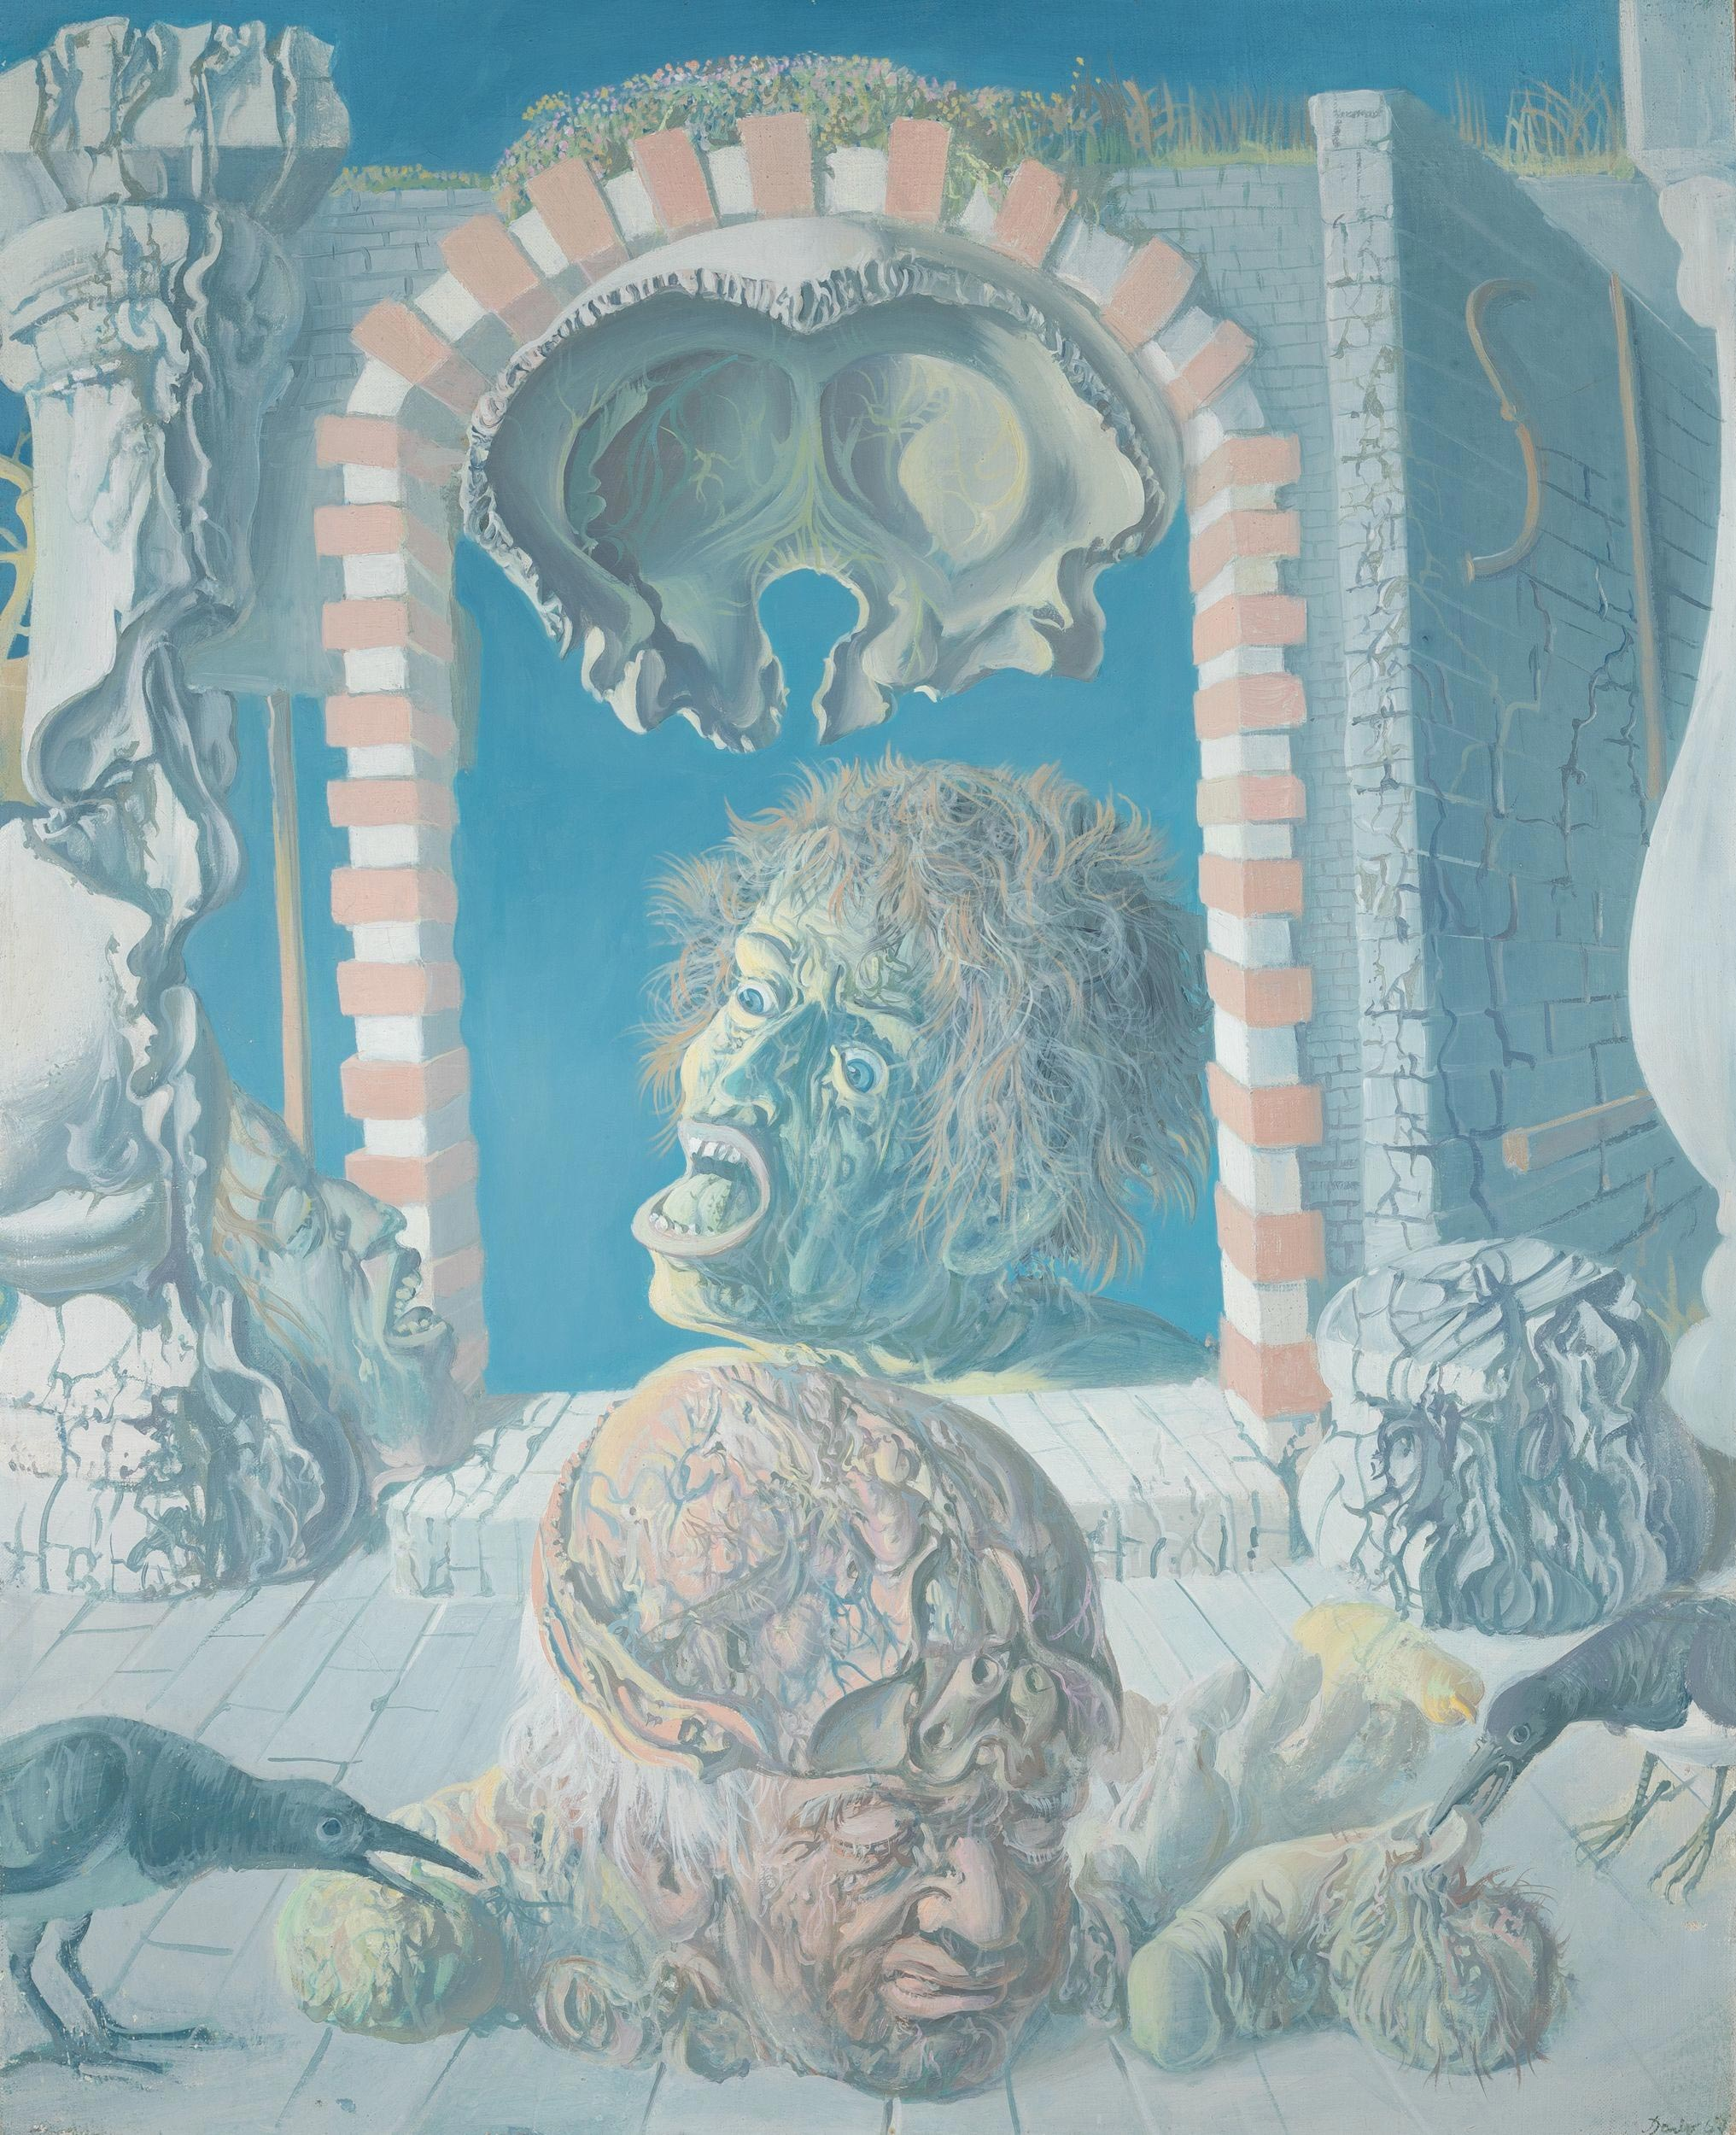 Judith aux pies, 1967